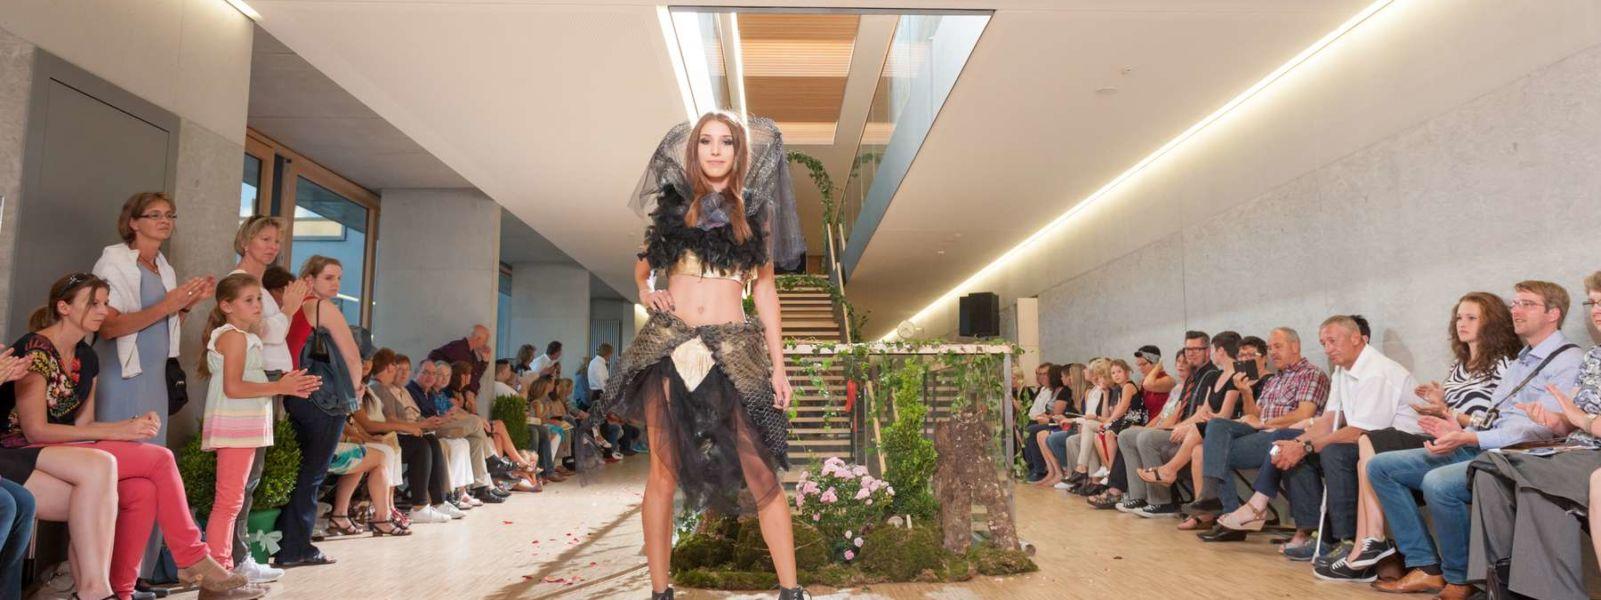 Fotografie RR Eventshooting - Modenacht Radolfzell Catwalk Model